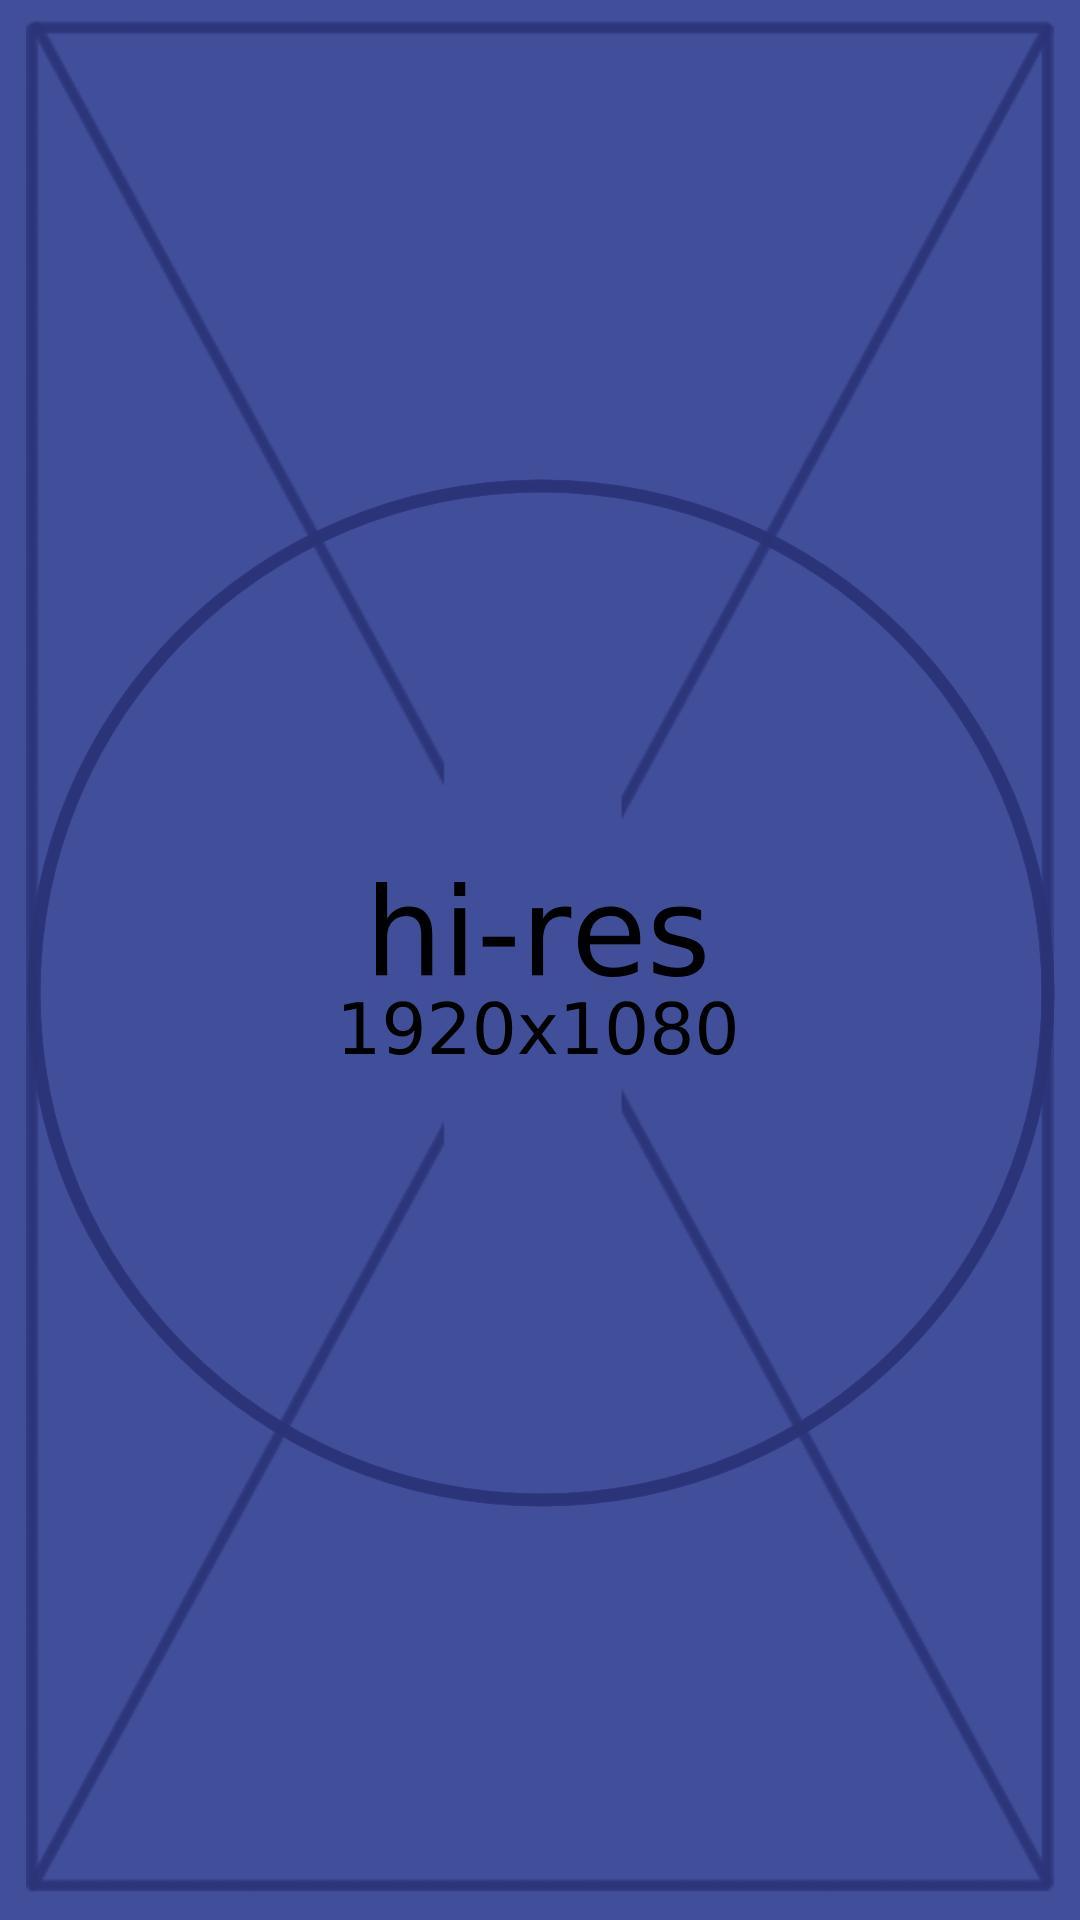 0_sources/0ther/artworks/hi-res/2004-11-17_cobalt-misty-turtle_by-Sir-Gerard-Metalongname.jpg